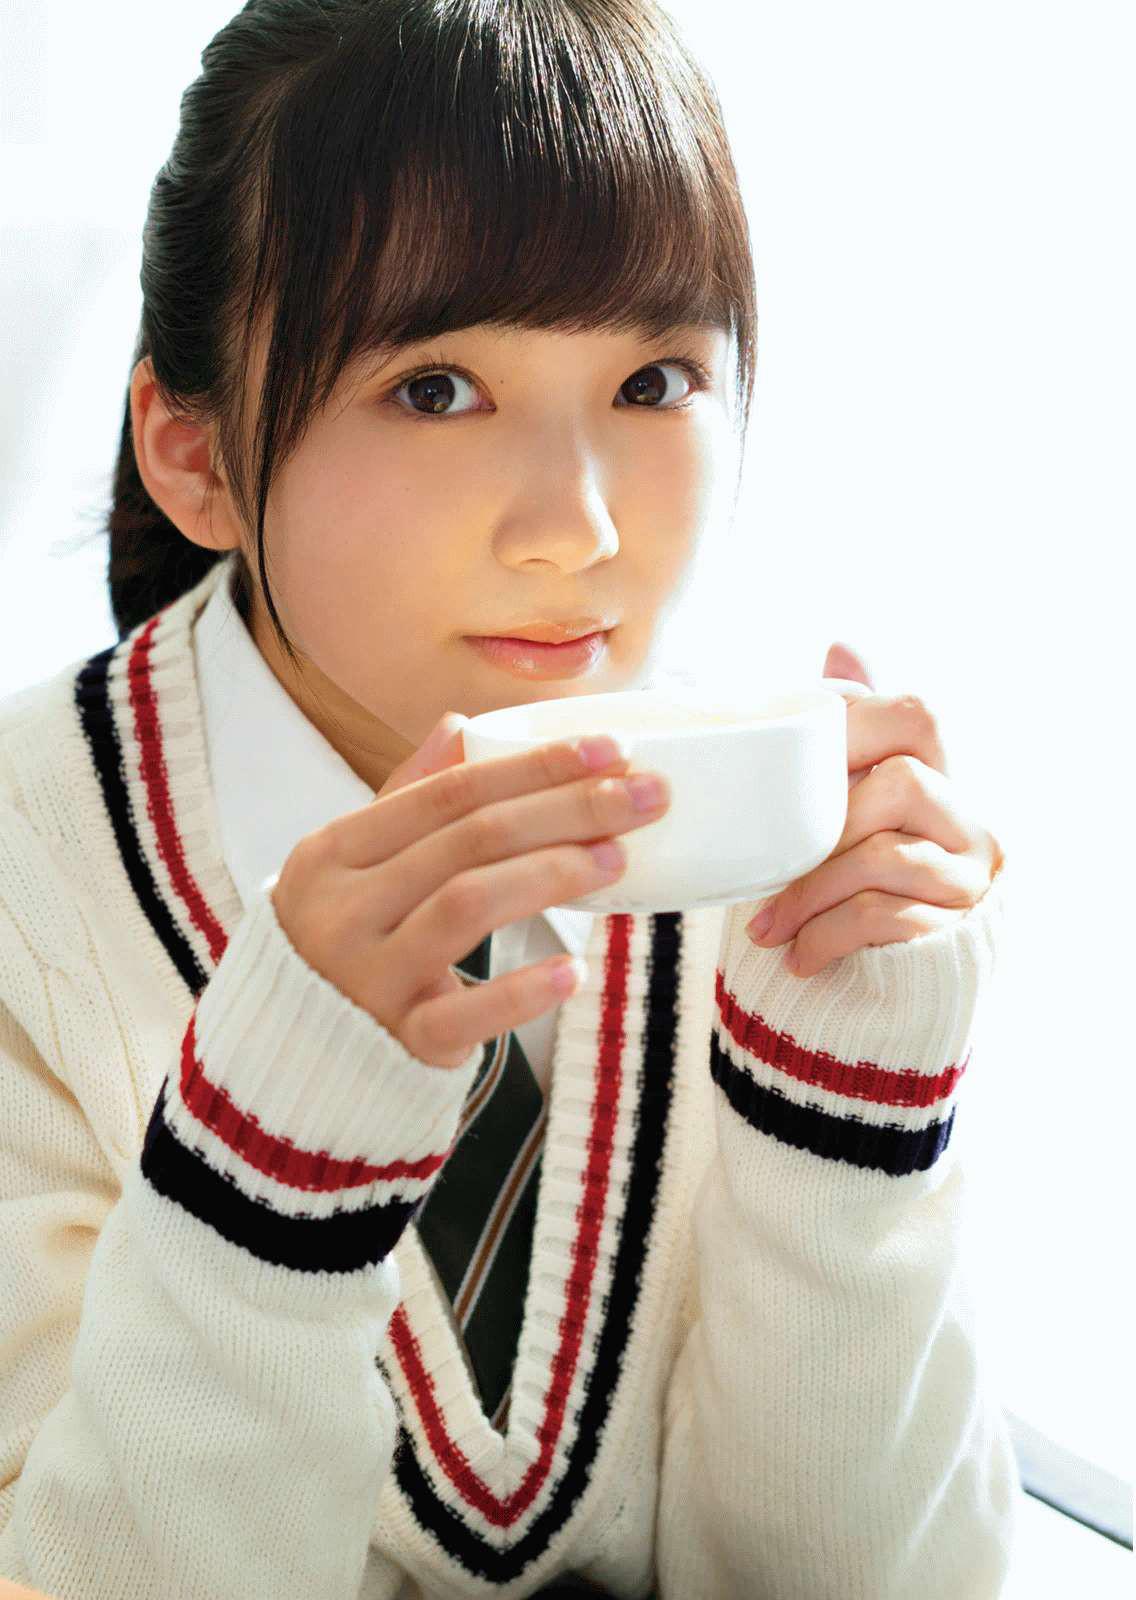 HKT48矢吹奈子(16)の胸チラ、水着グラビアエロ画像34枚・9枚目の画像